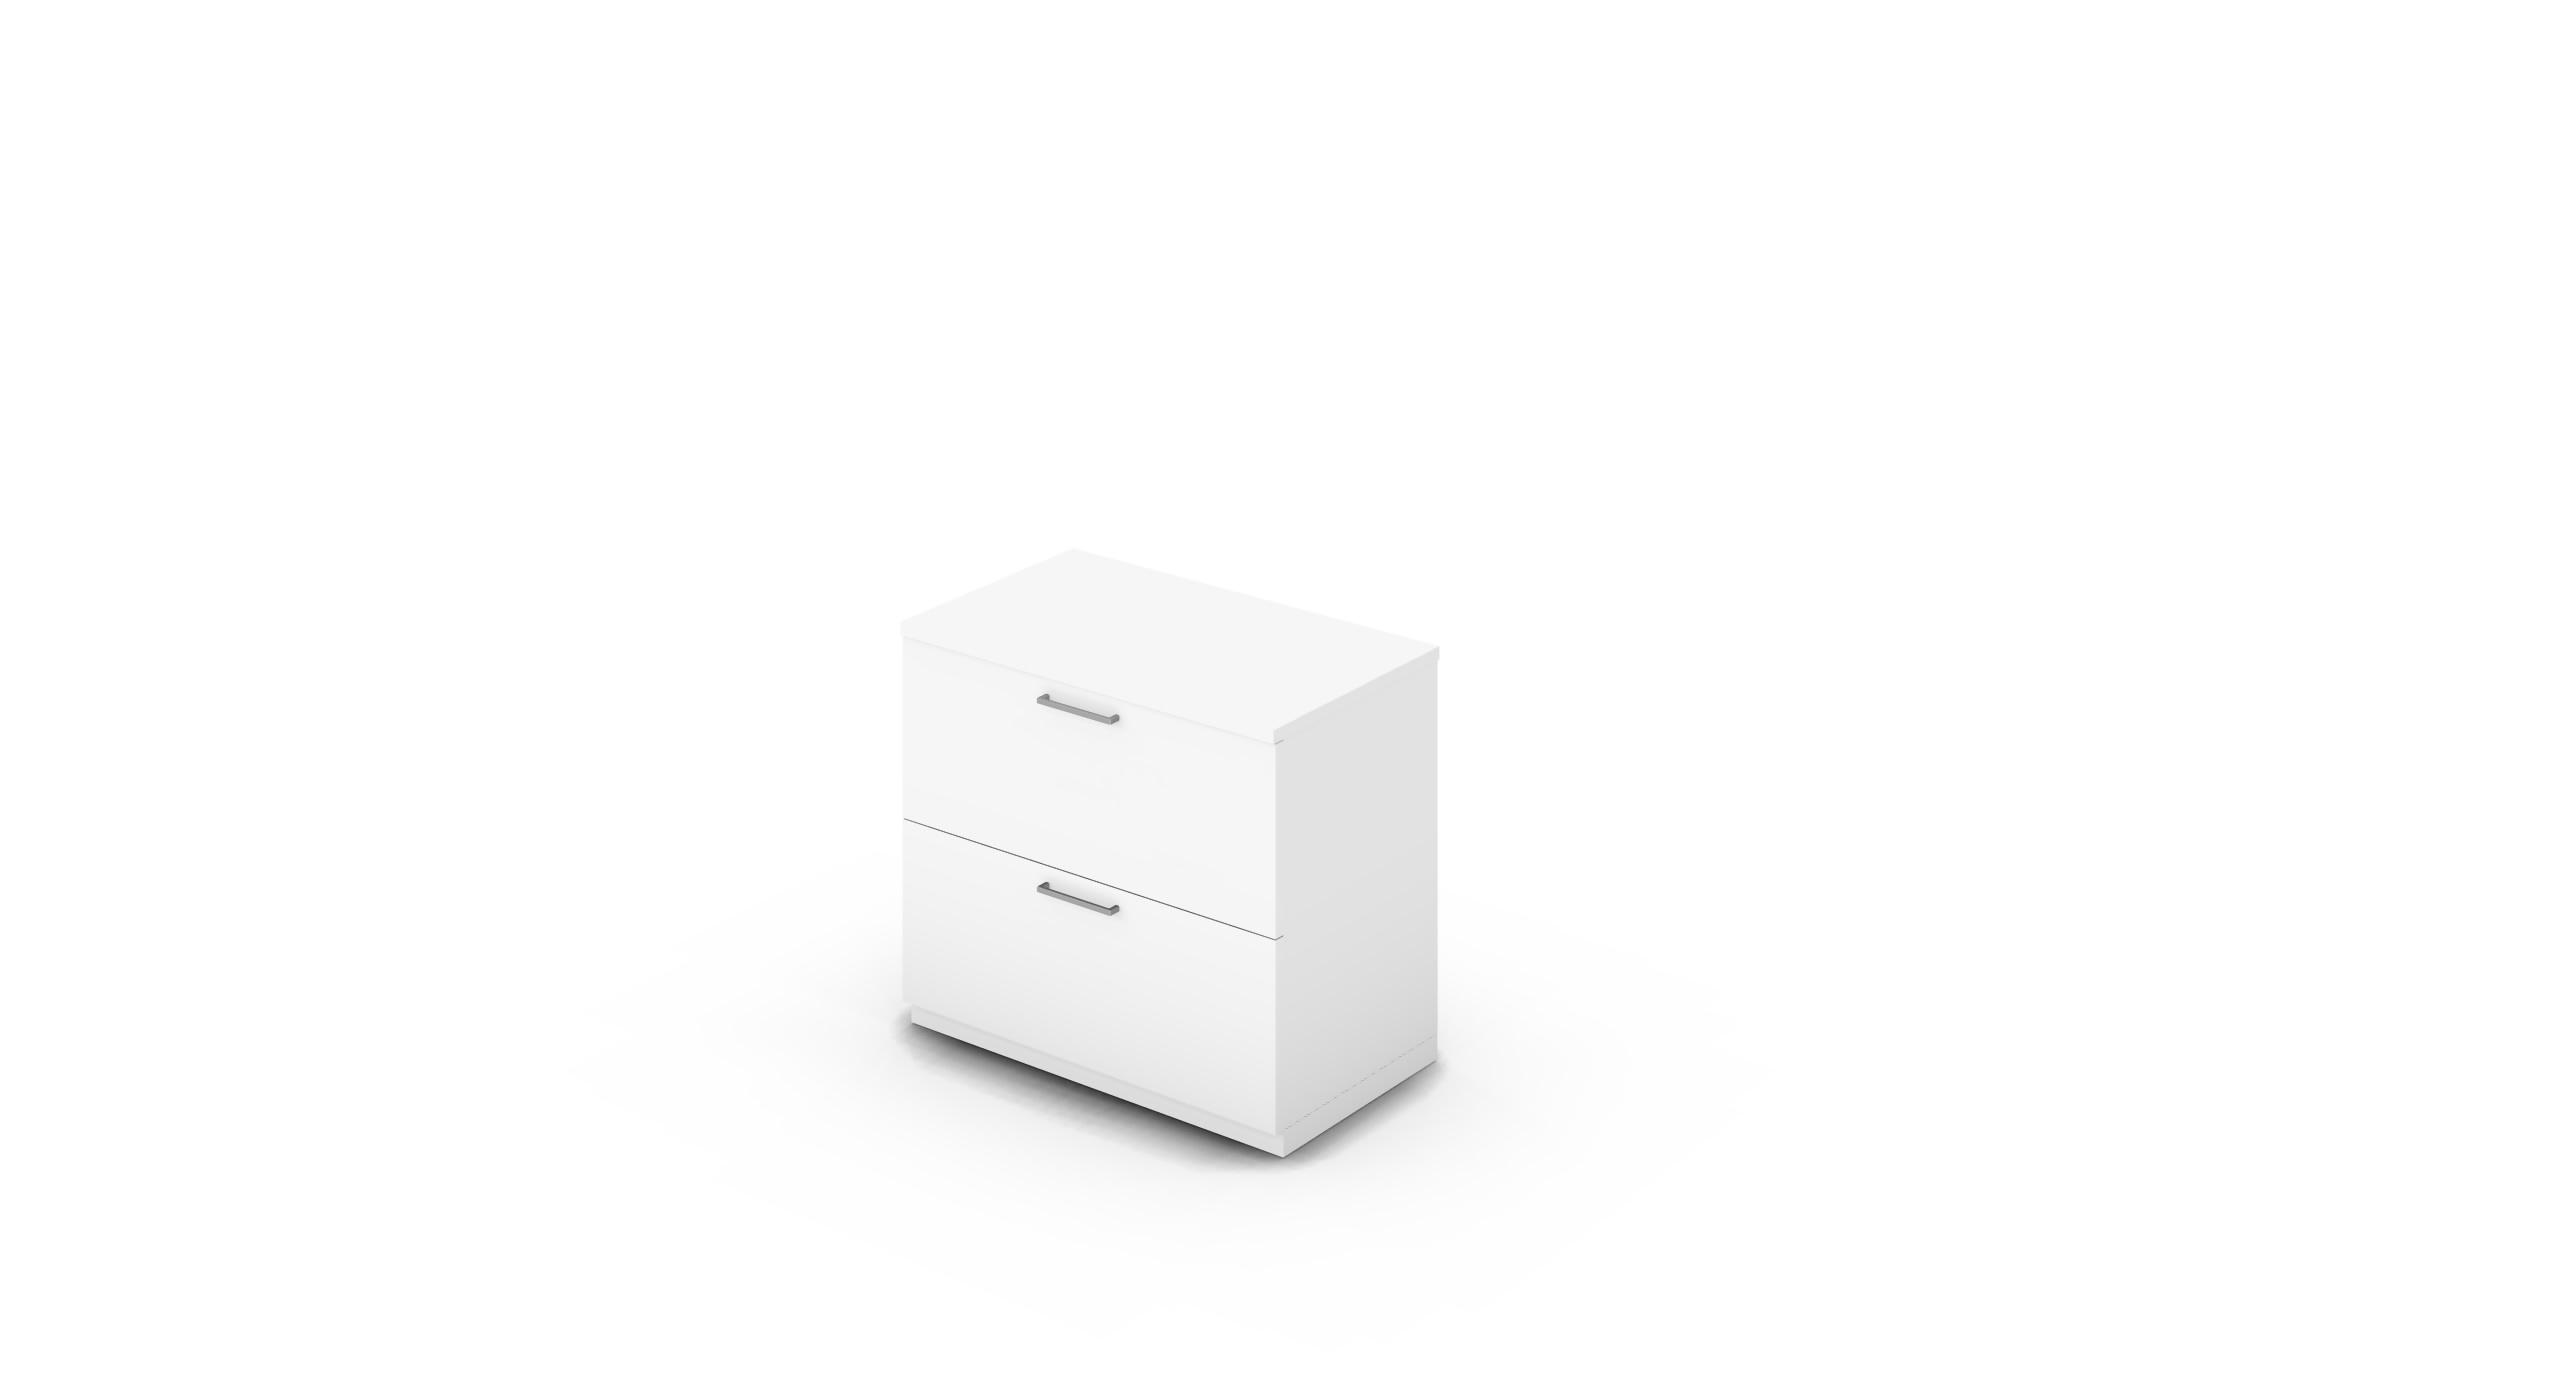 Cabinet_800x450x775_DR_White_Bar_Square_NoCylinder